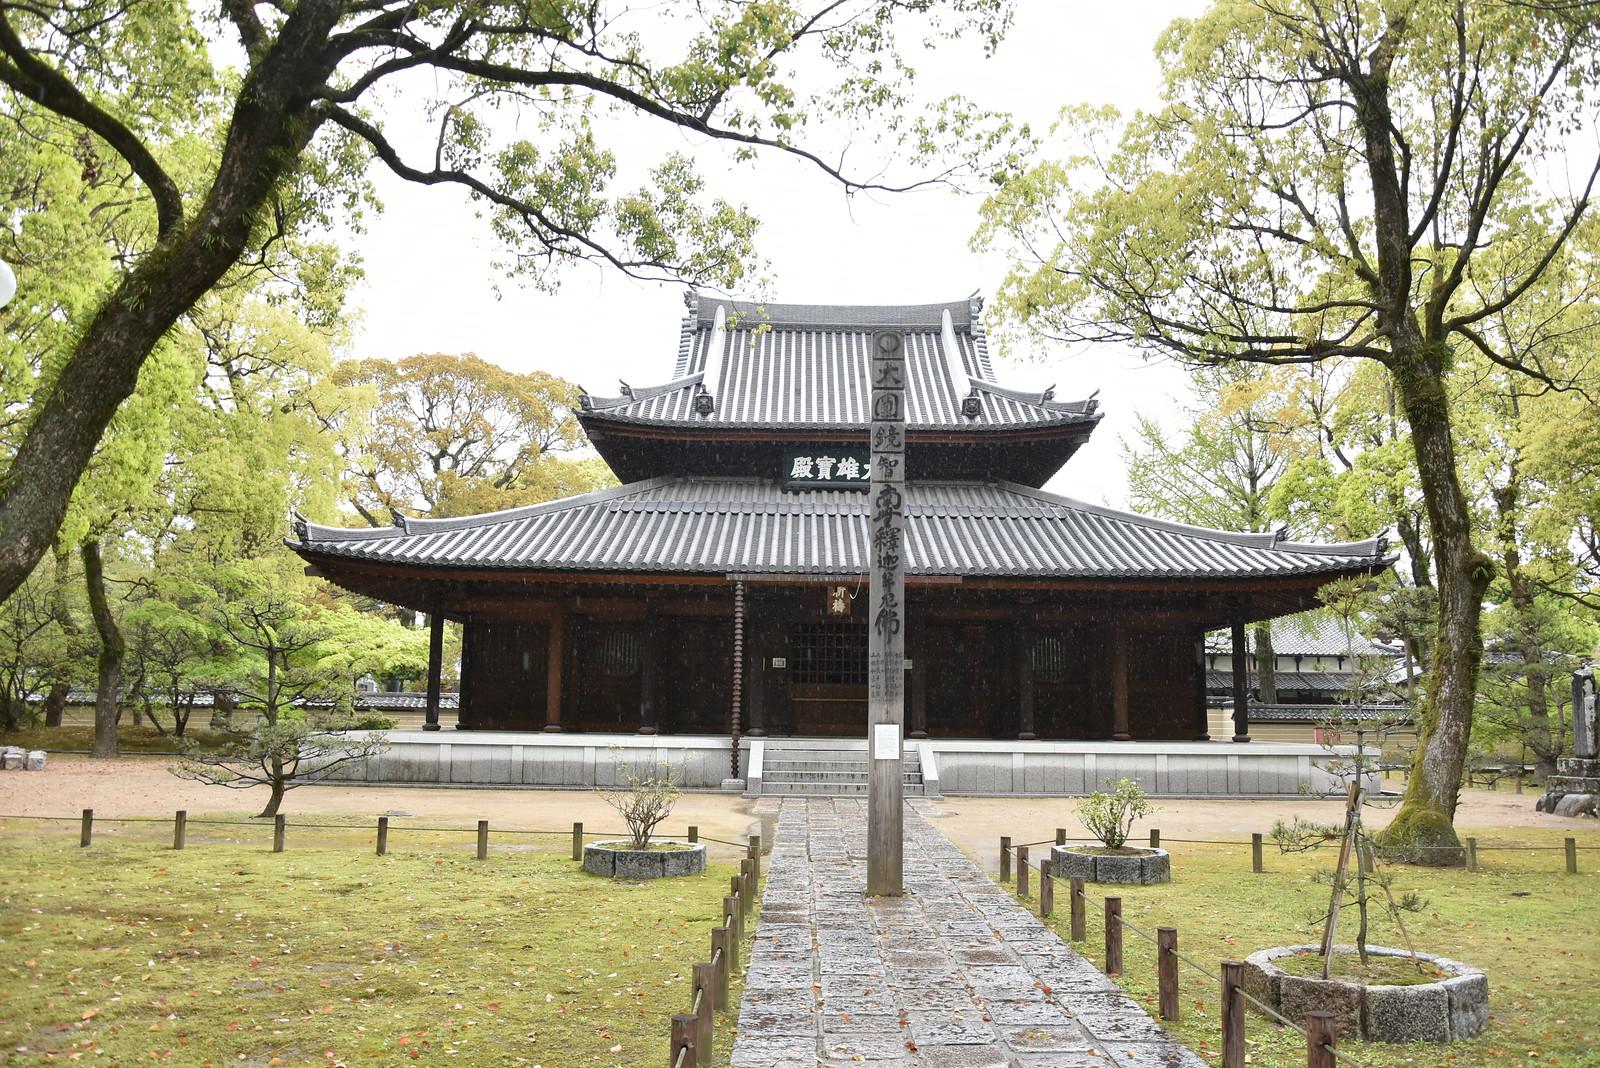 Fukuoka temples